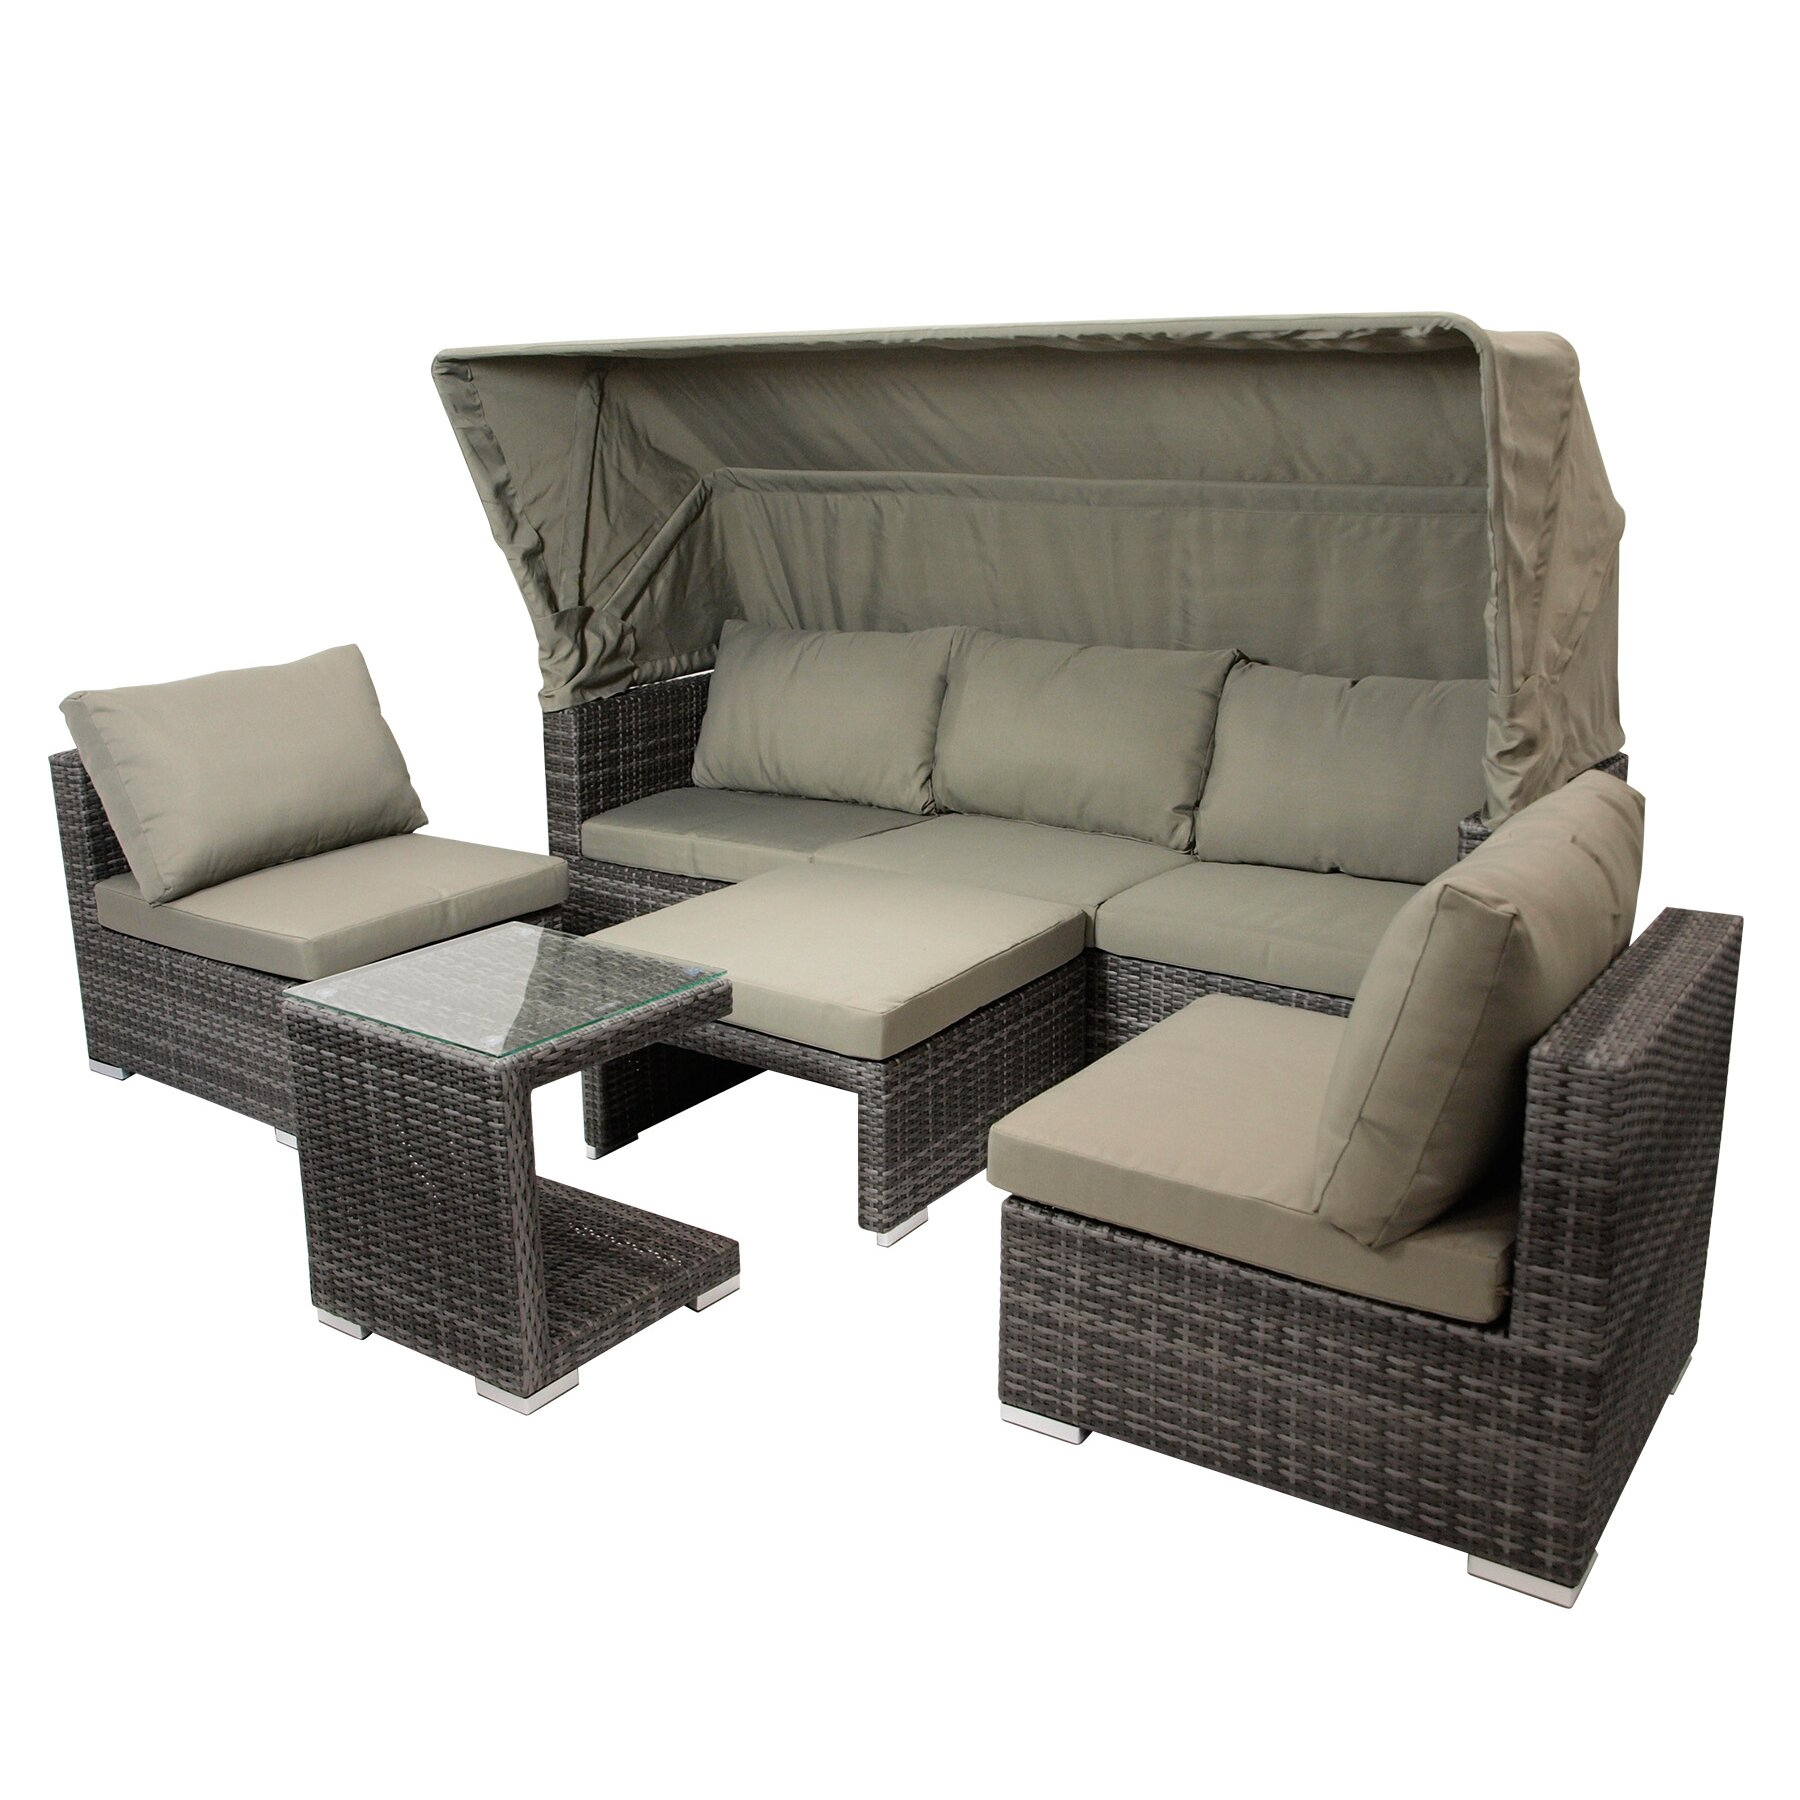 Garten living 7 sitzer sofa set berlin for Sofa 7 sitzer